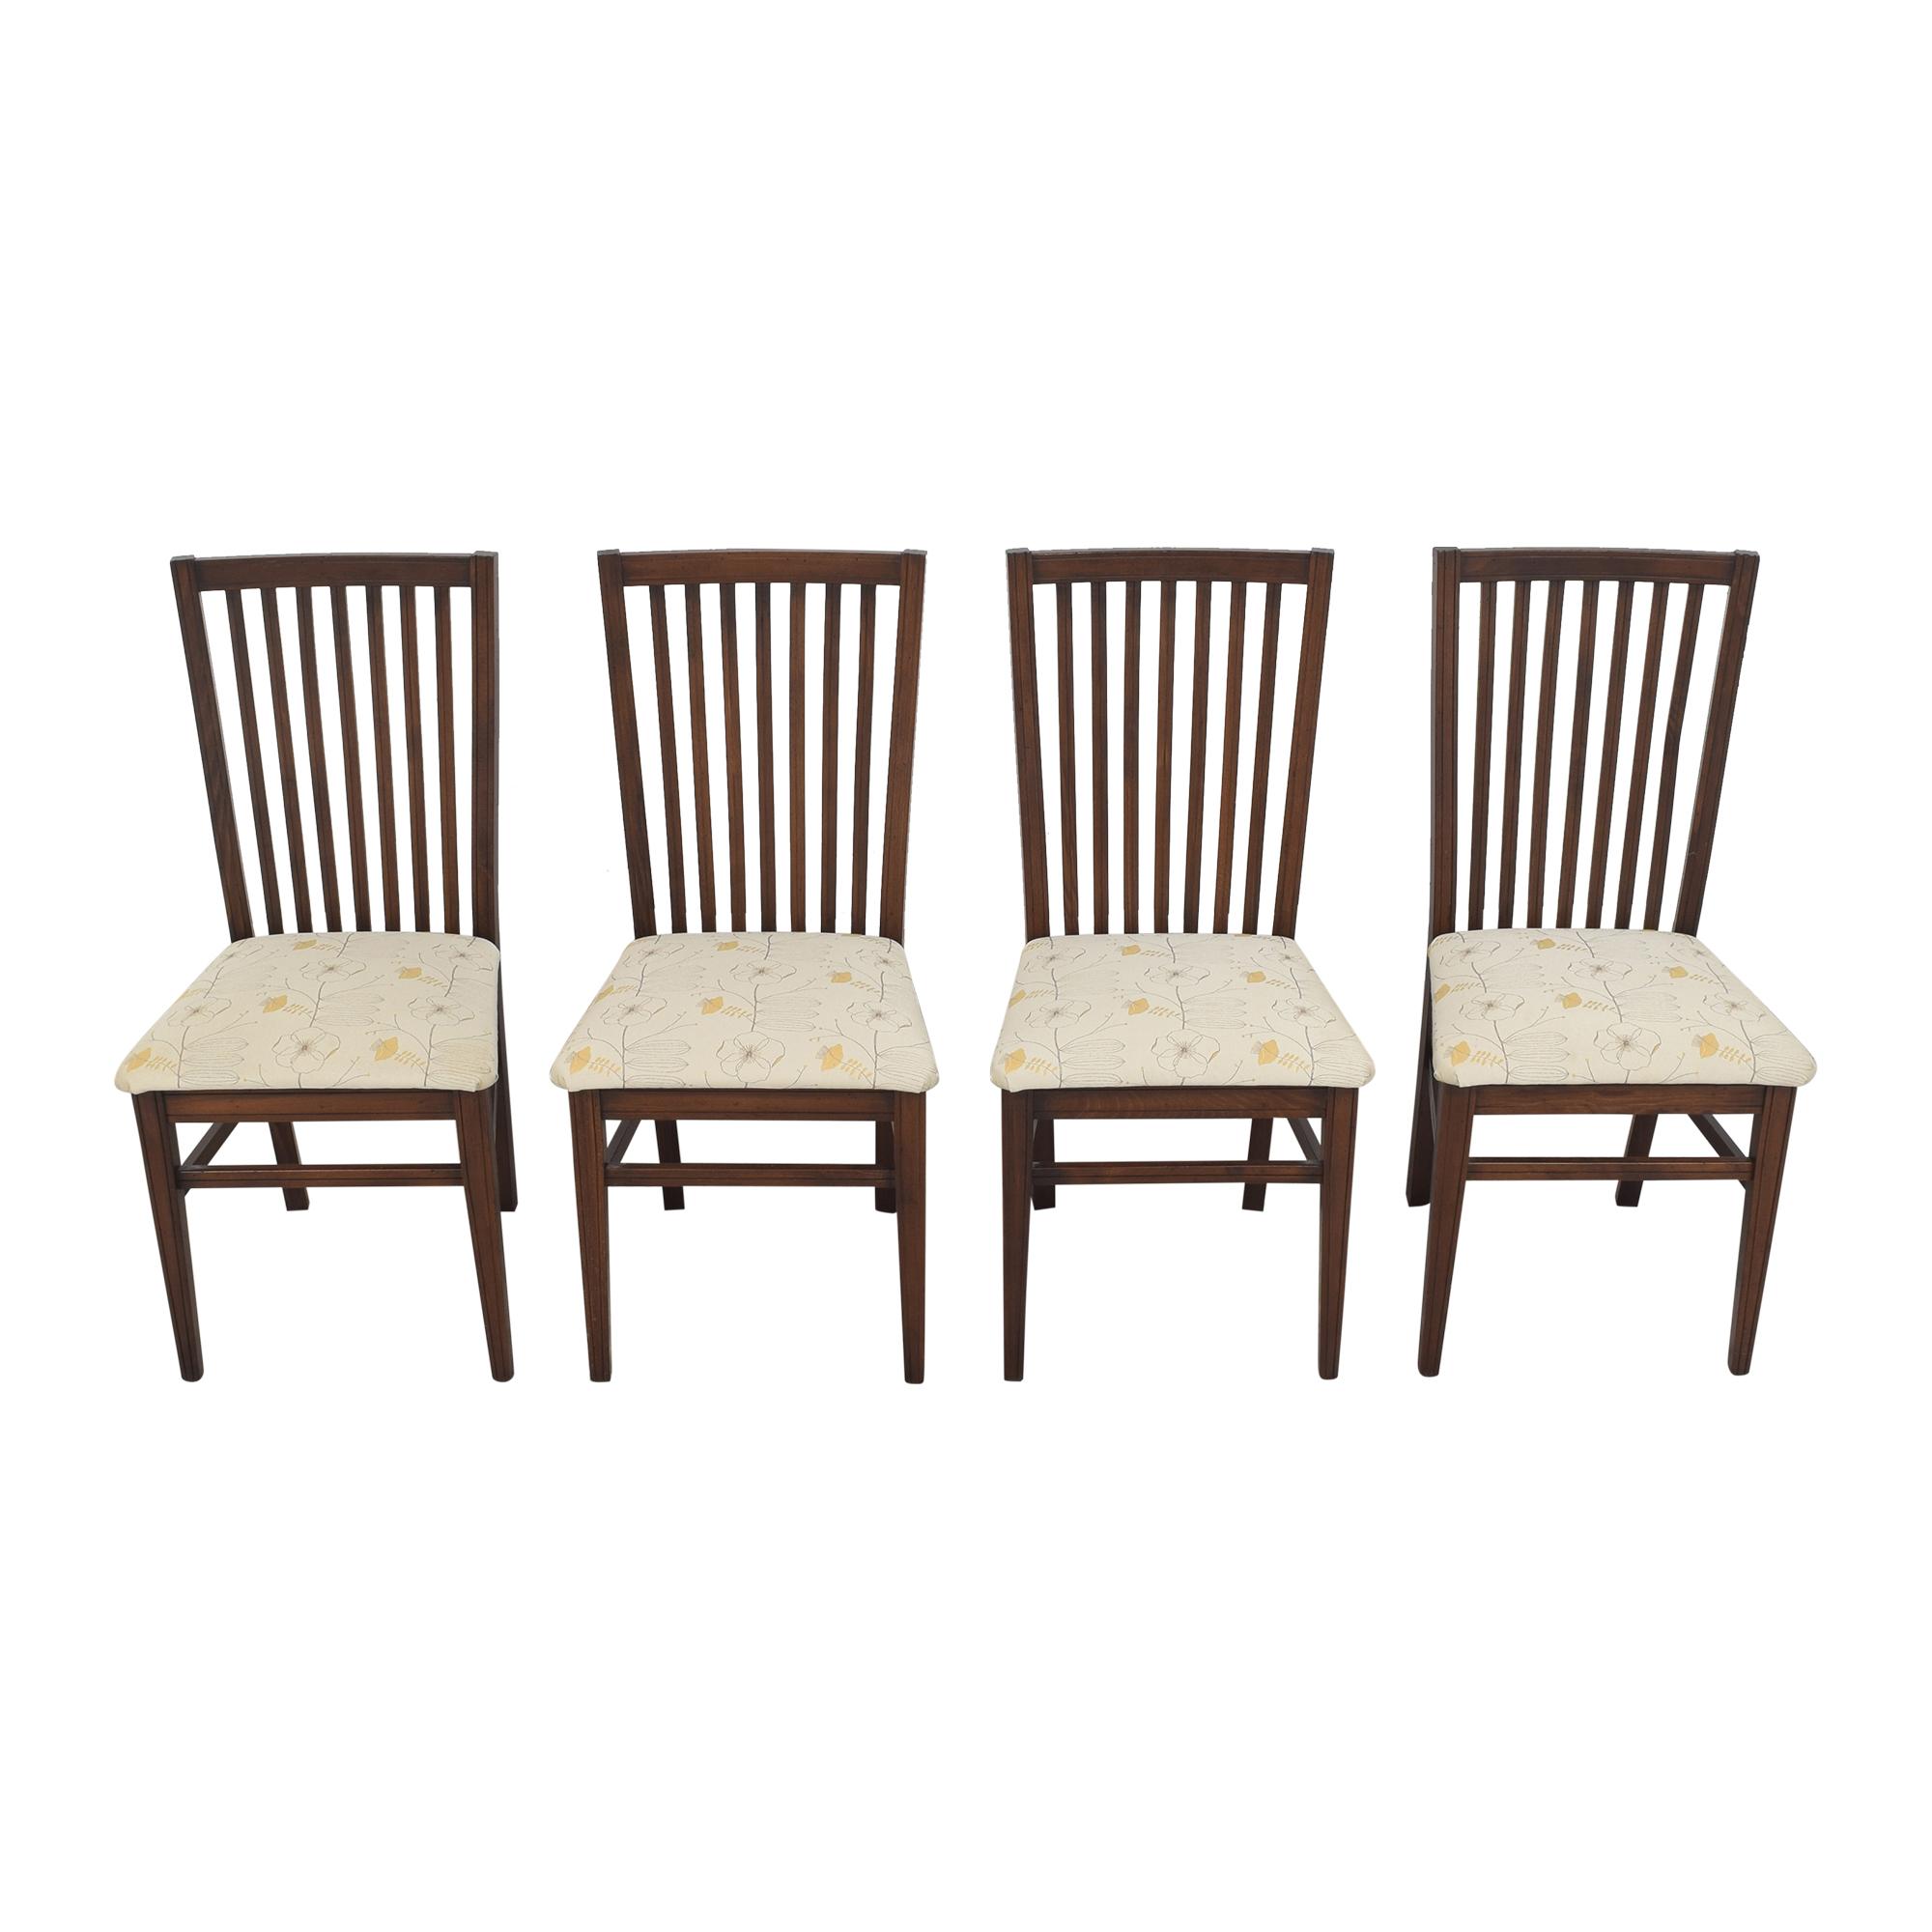 Arhaus Arhaus Anna Dining Side Chairs Chairs